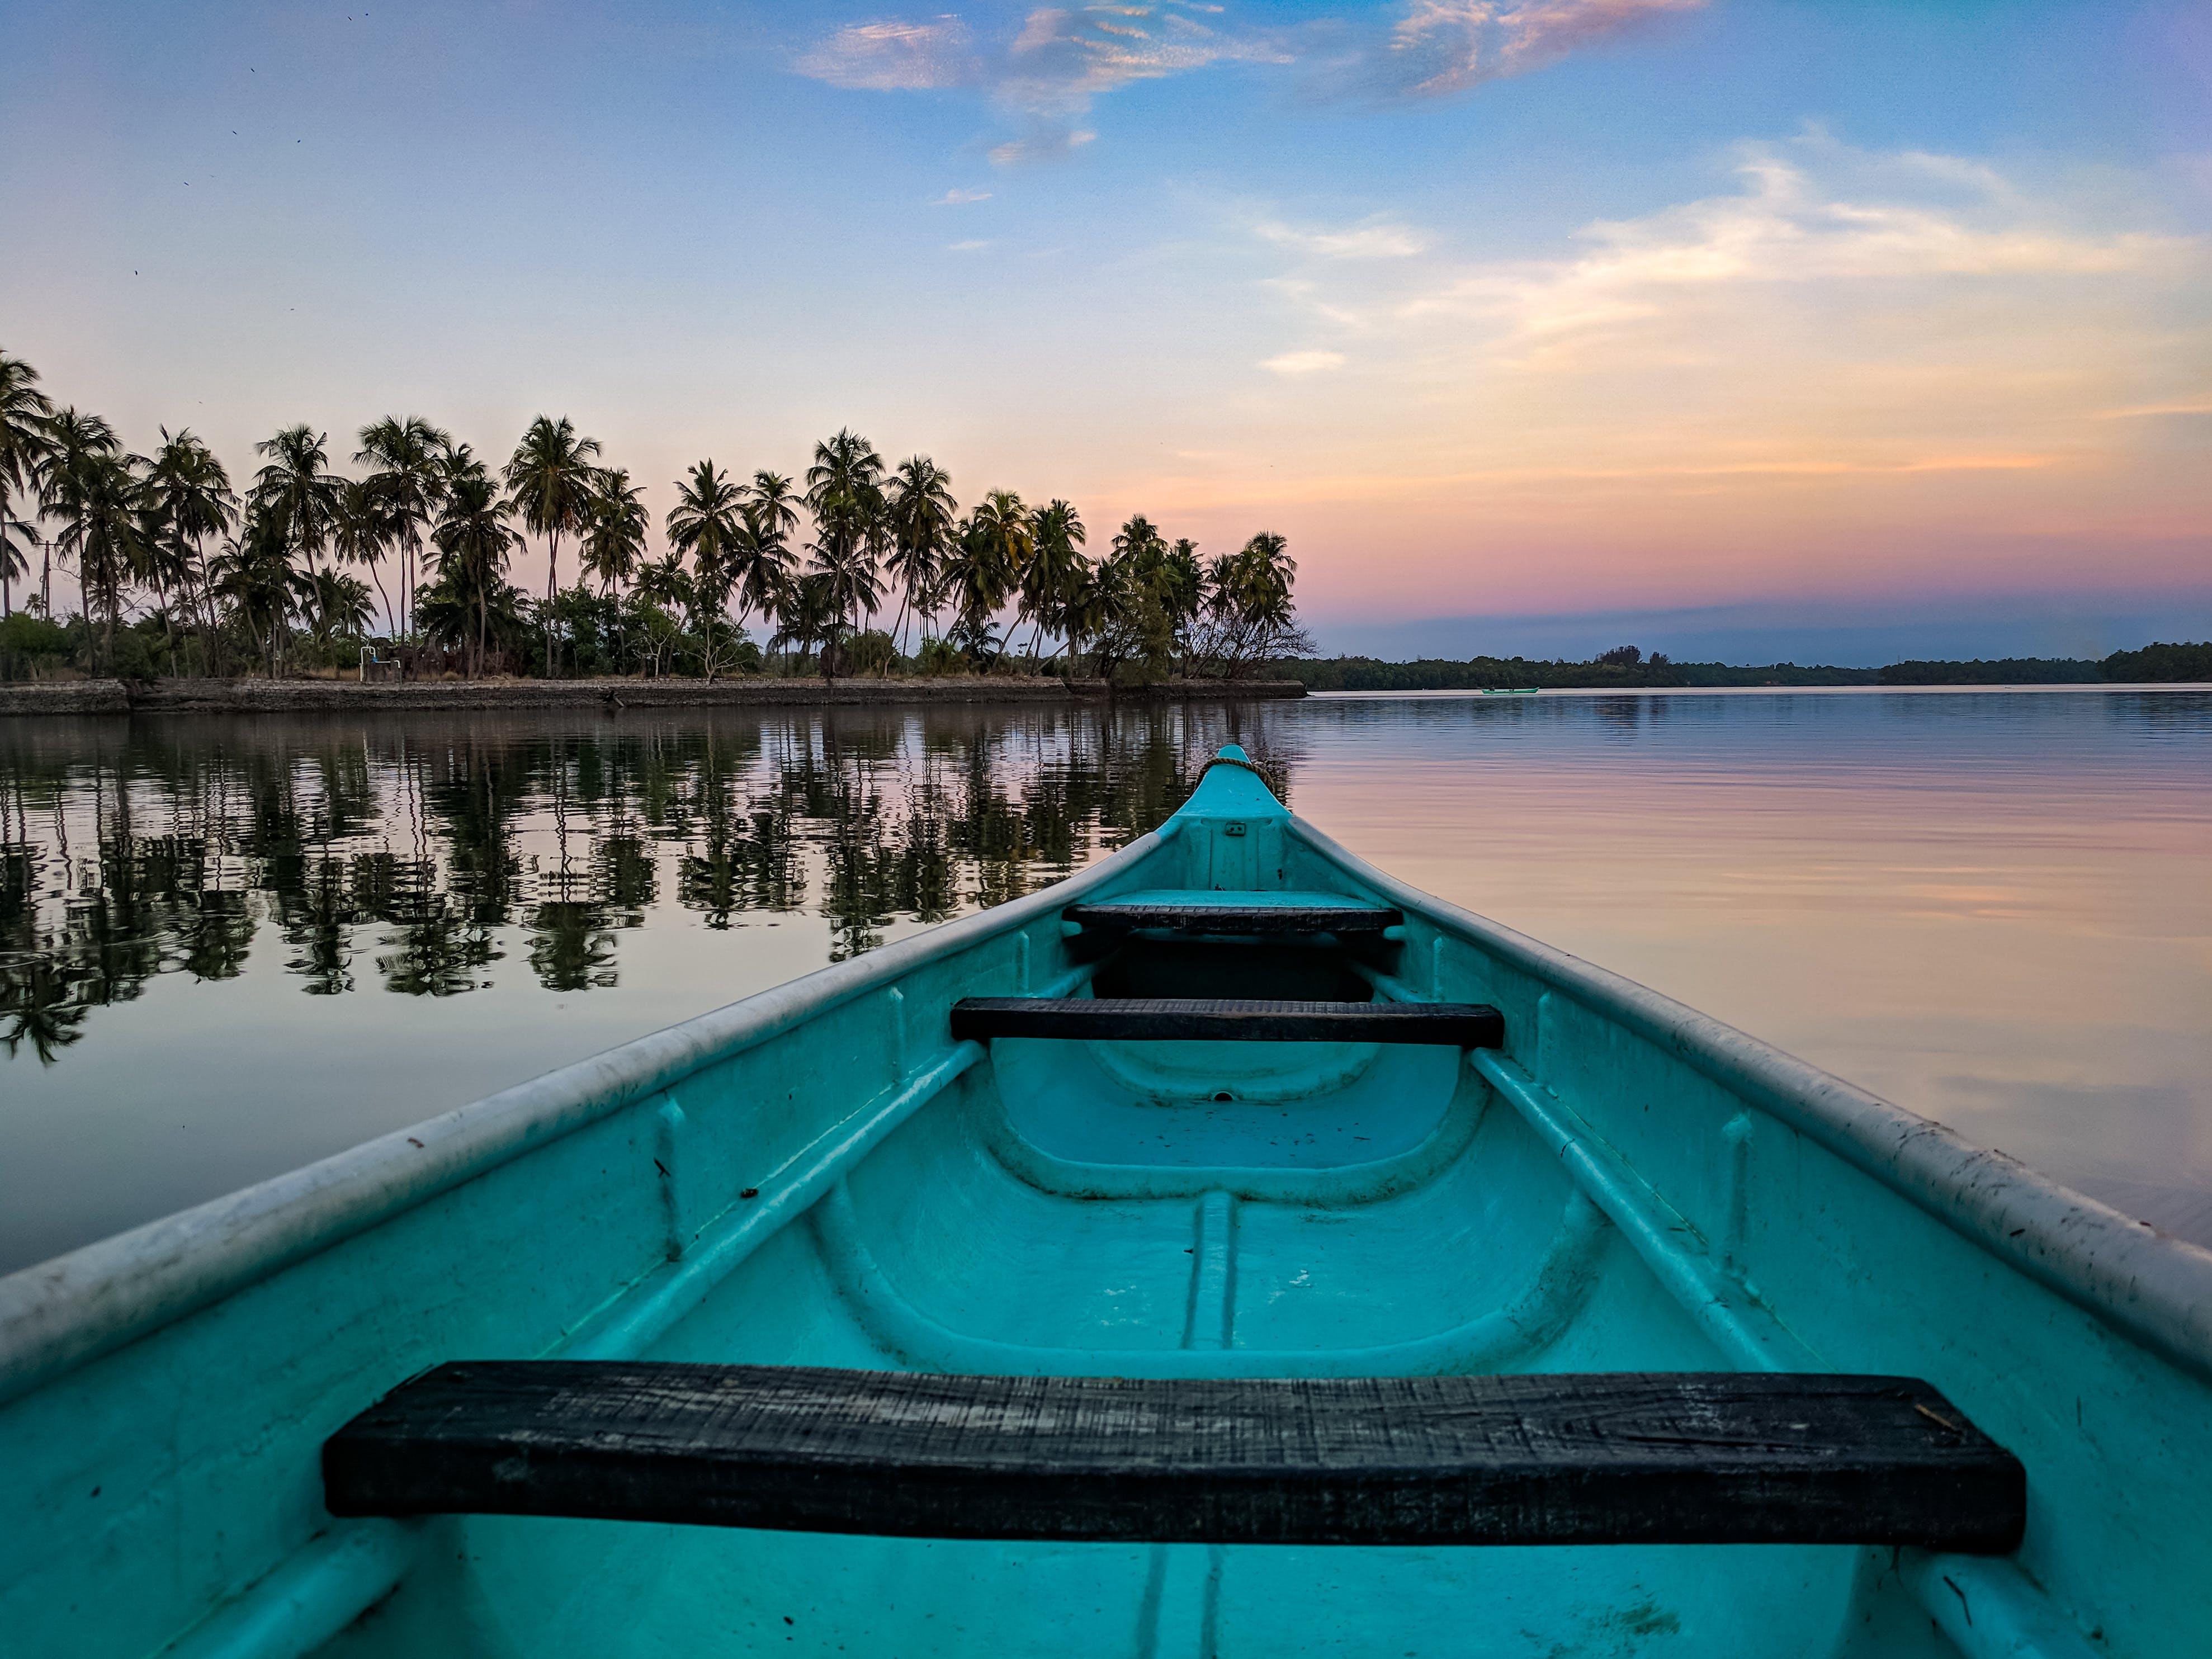 aigua, arbres, barca